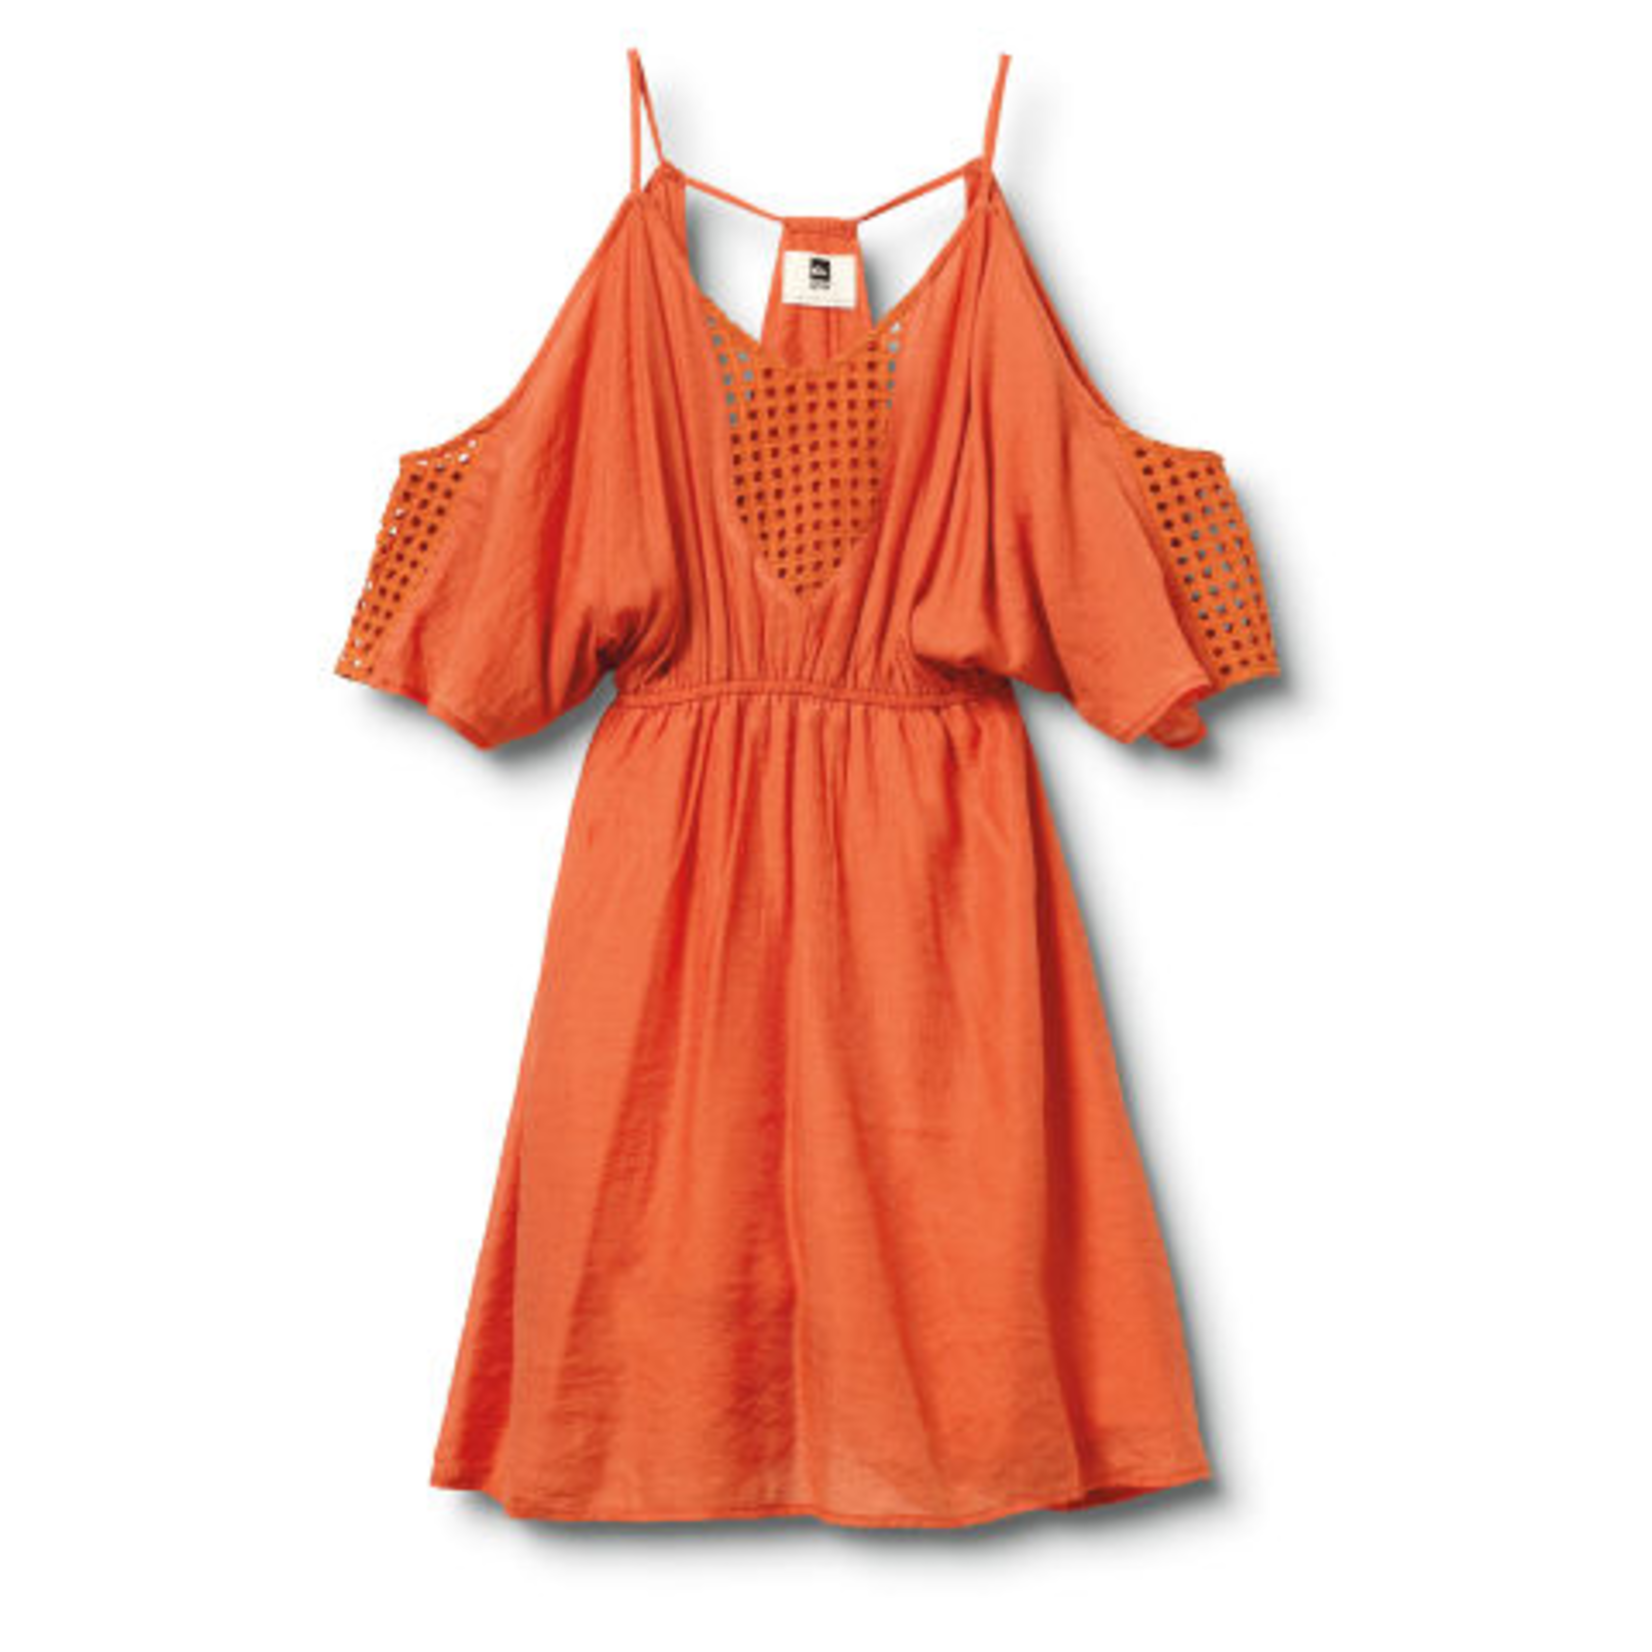 Quiksilver Quiksilver Indian Summer Dress, SALE item, Was $88 now $52